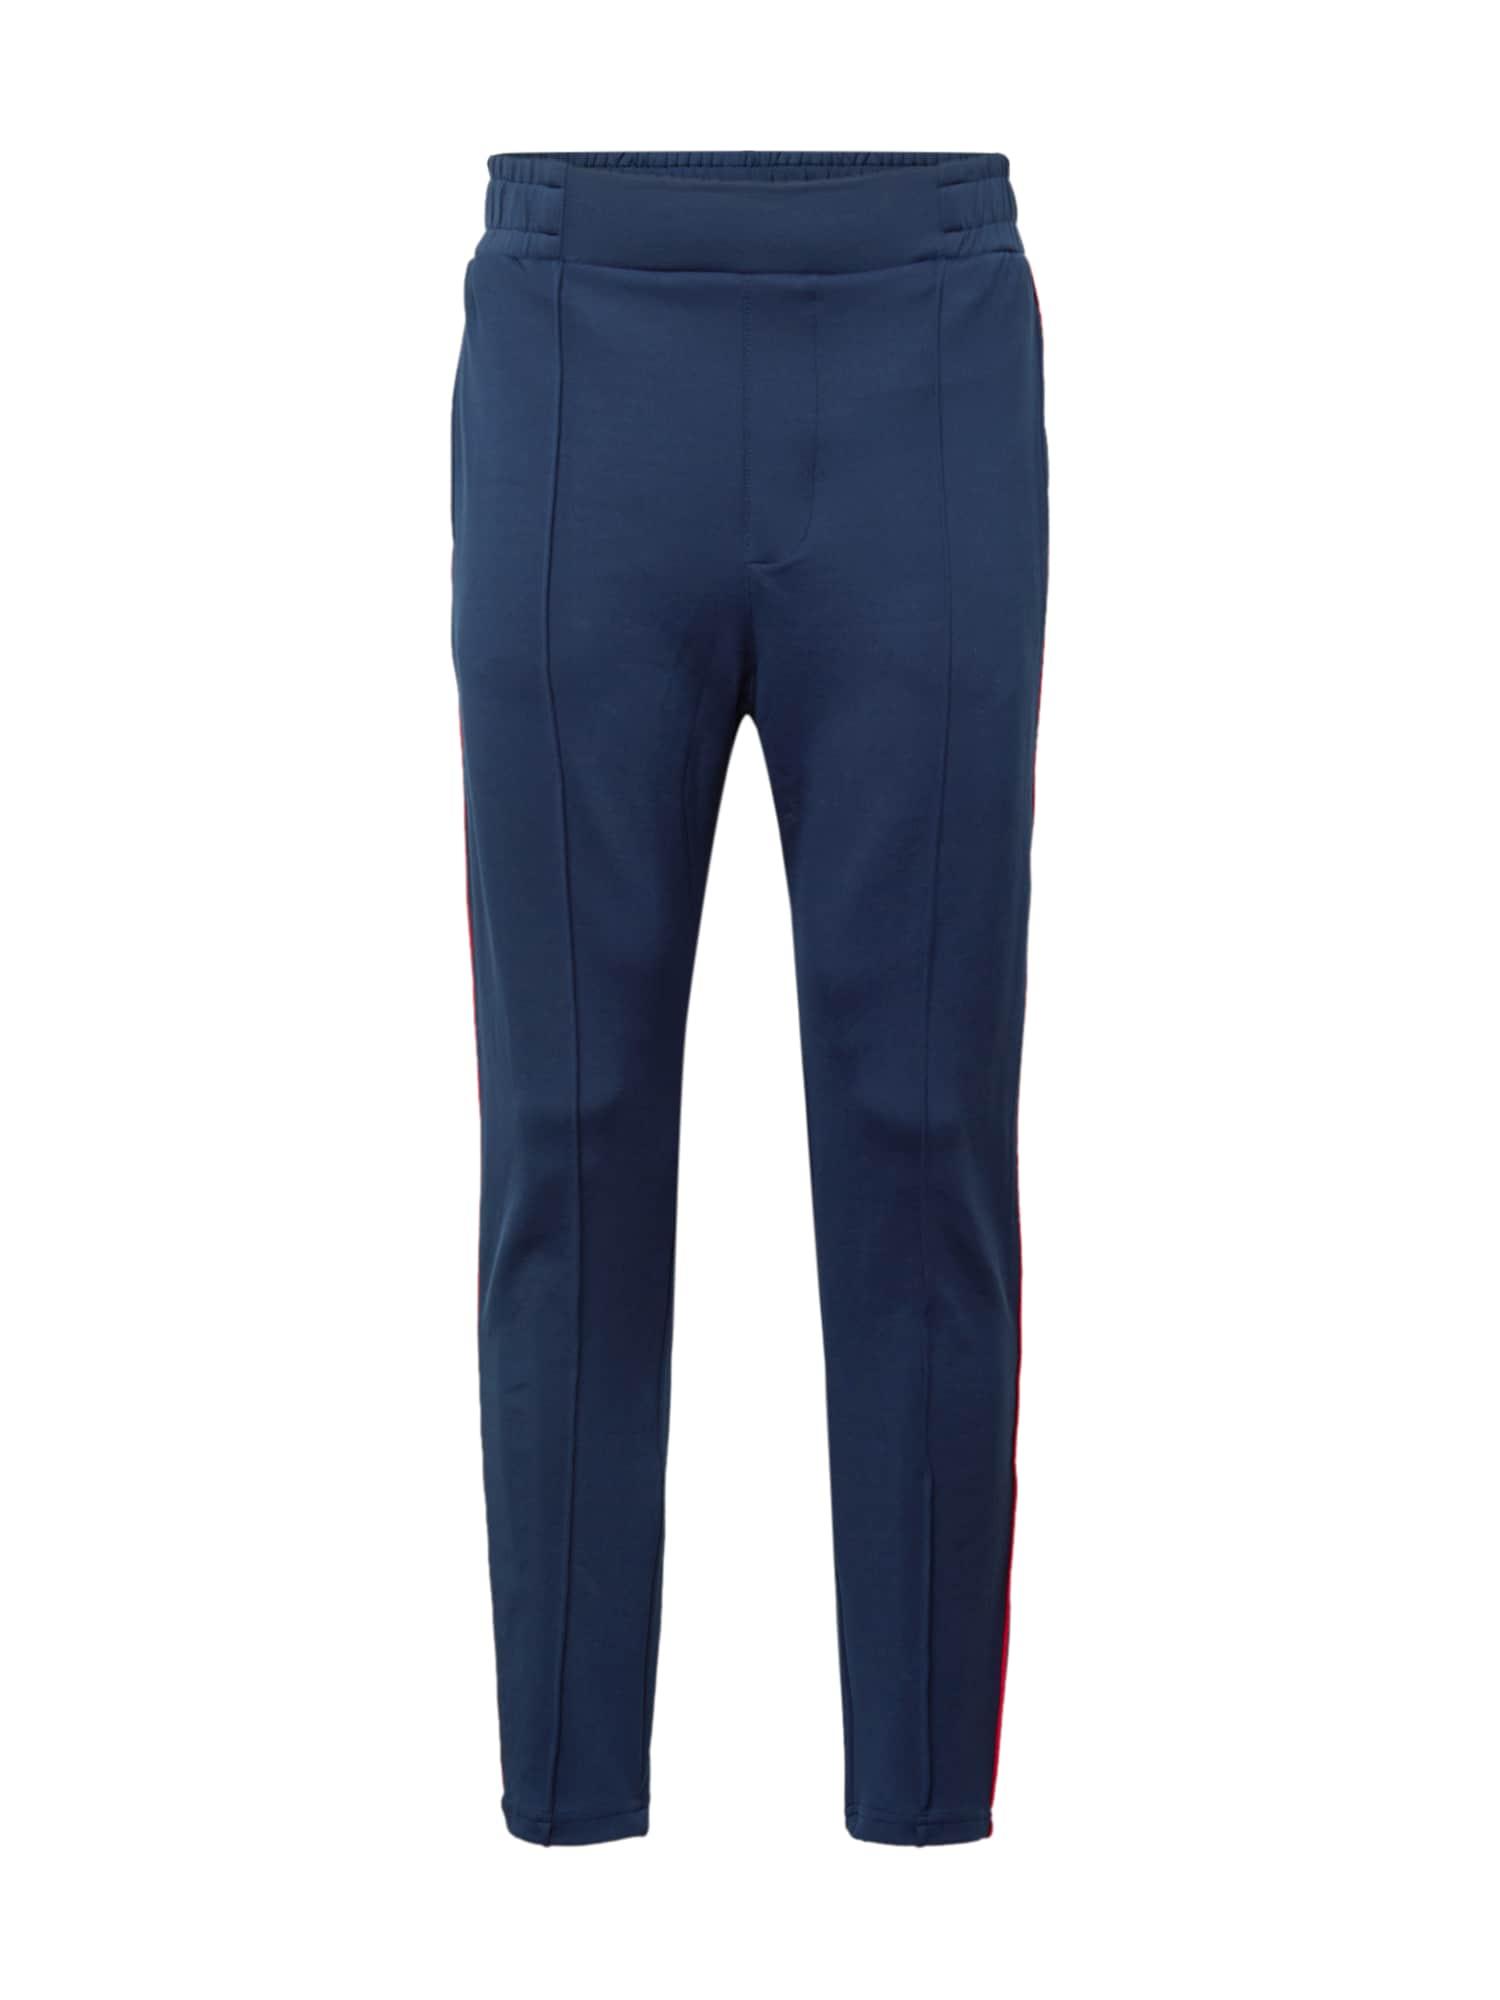 TOM TAILOR DENIM Kalhoty  tmavě modrá